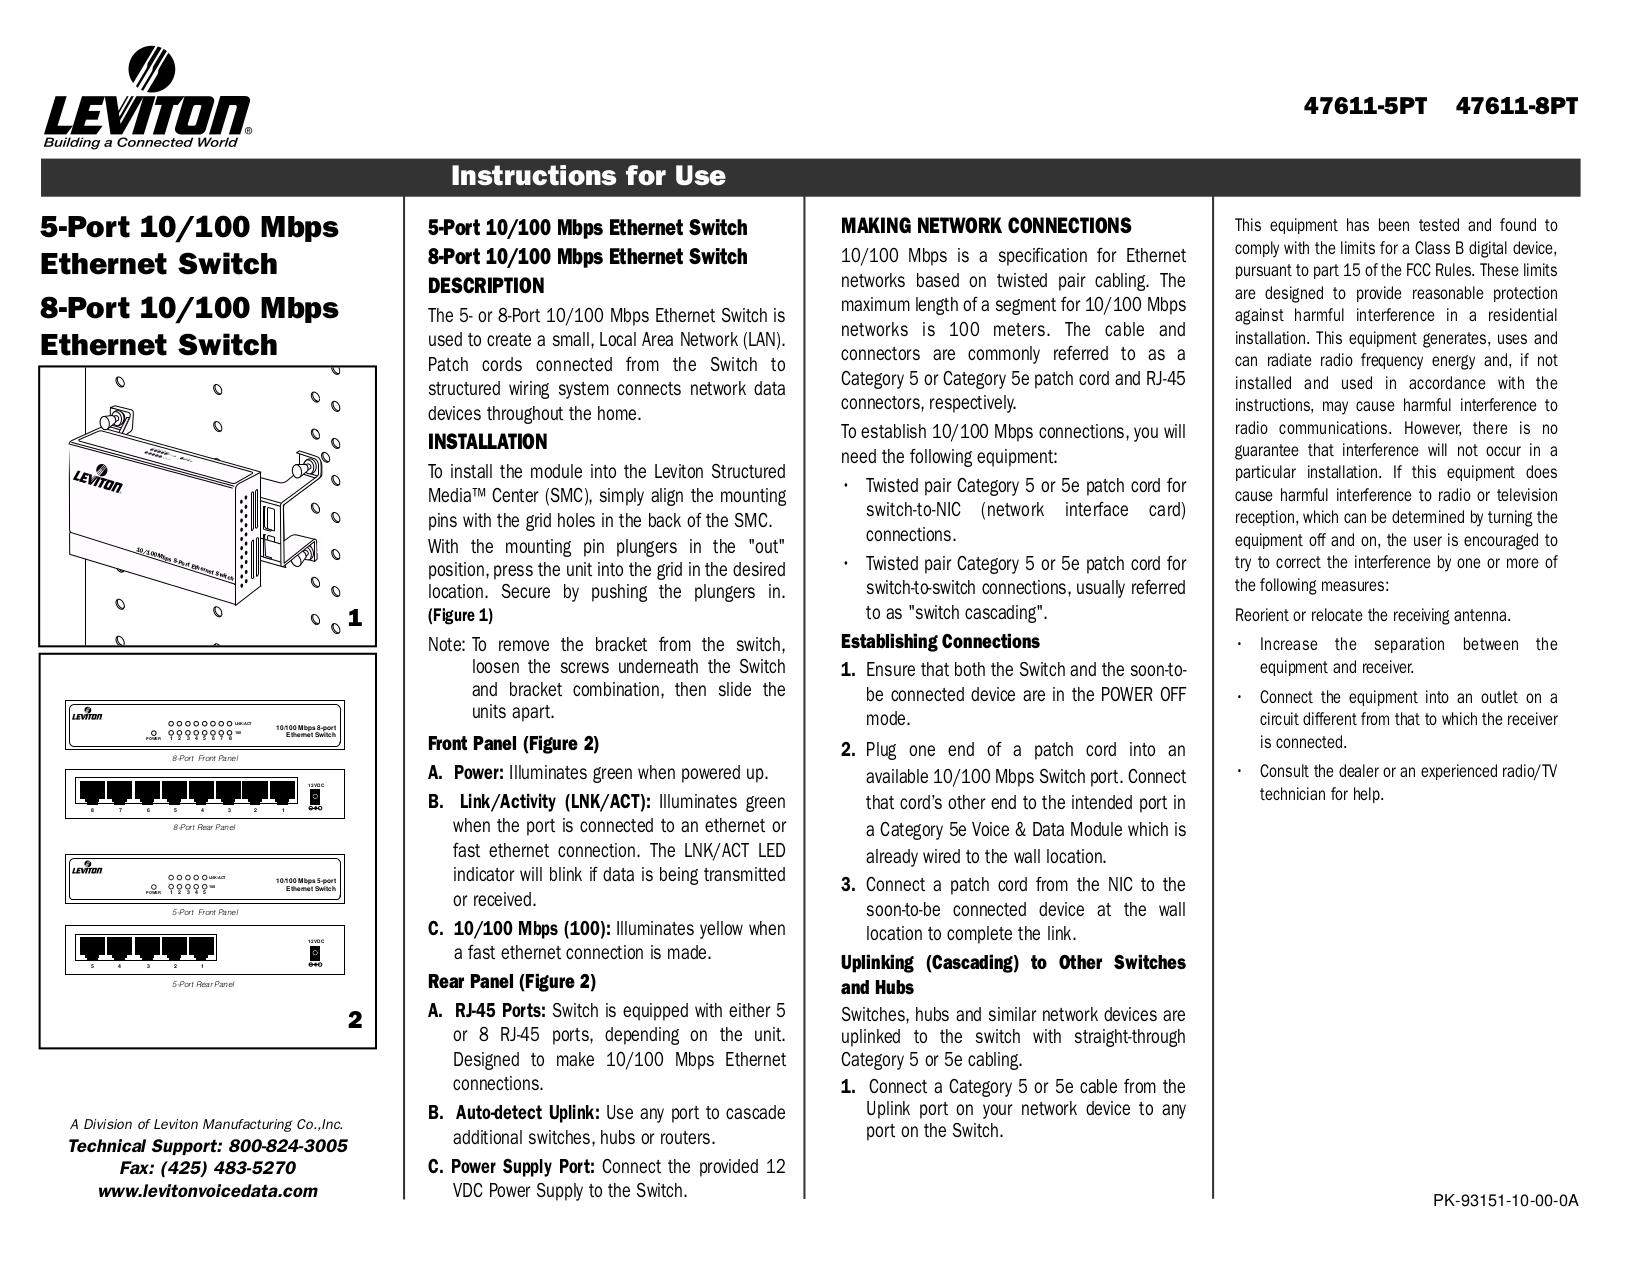 Hi I Am Installing A Leviton 3way Digital Timer Switch Vpt24